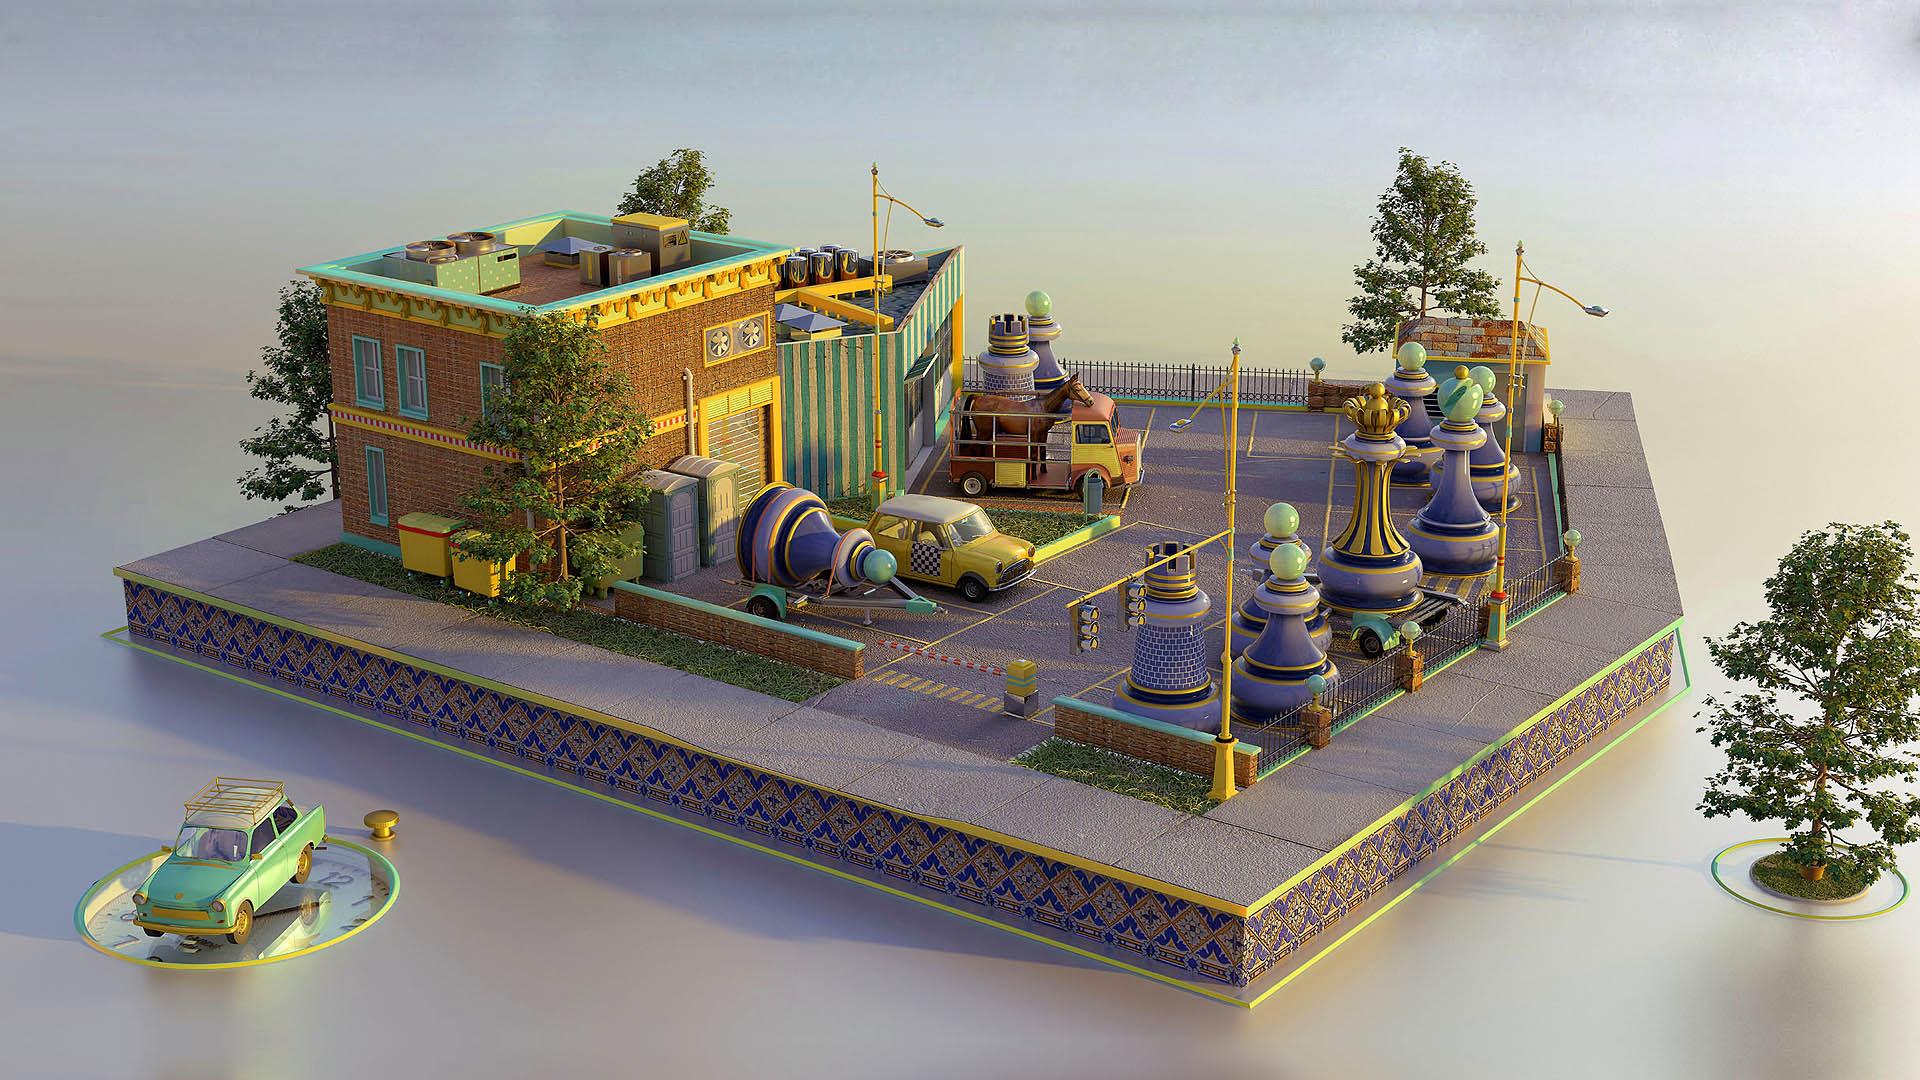 Roof-Studio-Vinicius-Costa-The-Chess-Lot.jpg